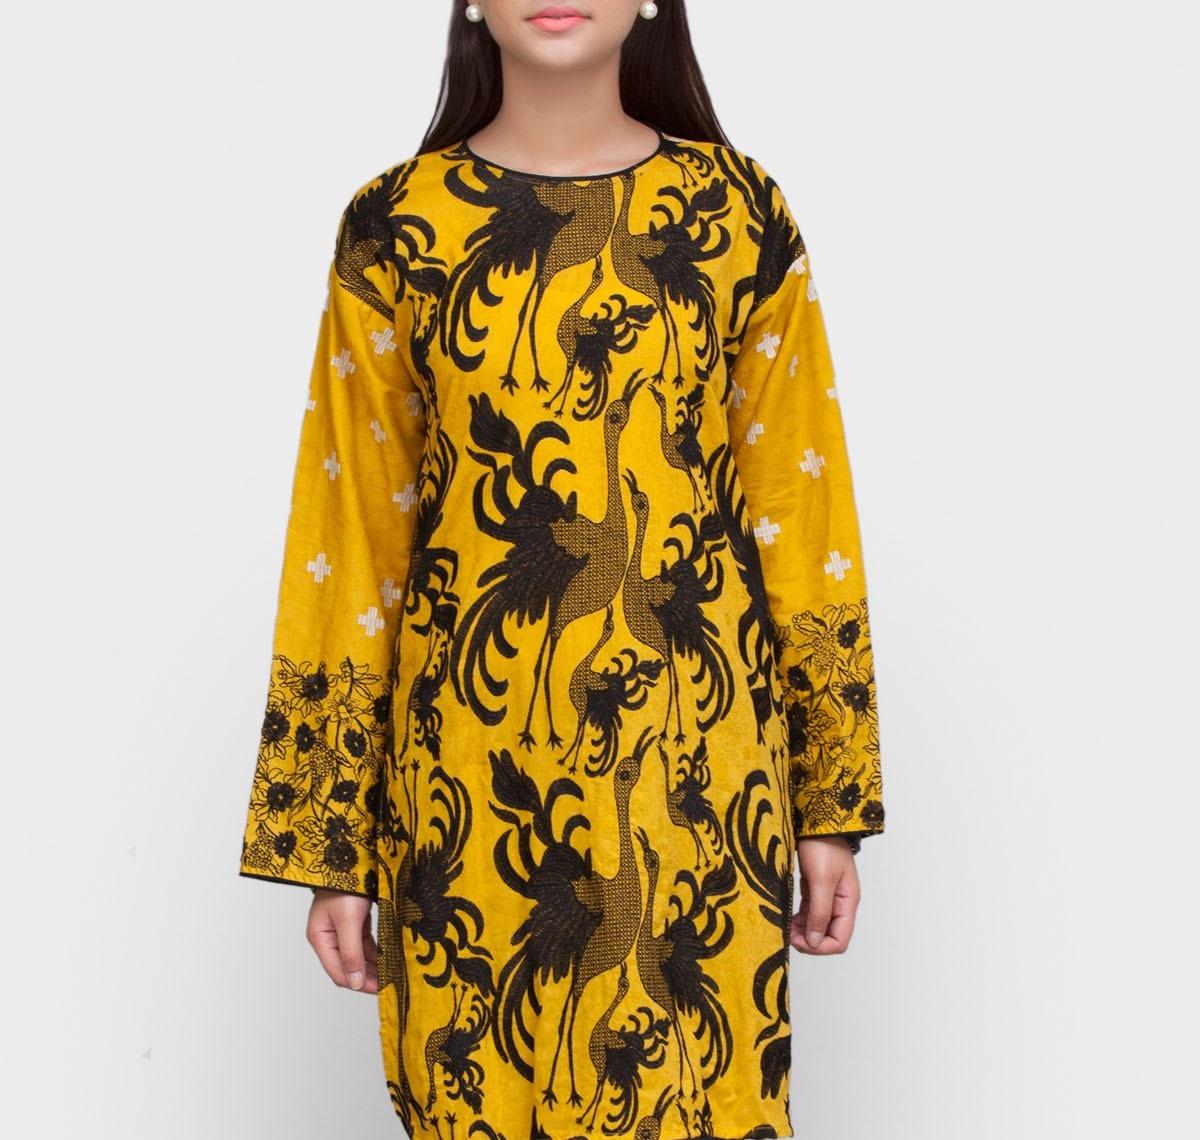 peacock design yellow winter tunic in honey bee contrast